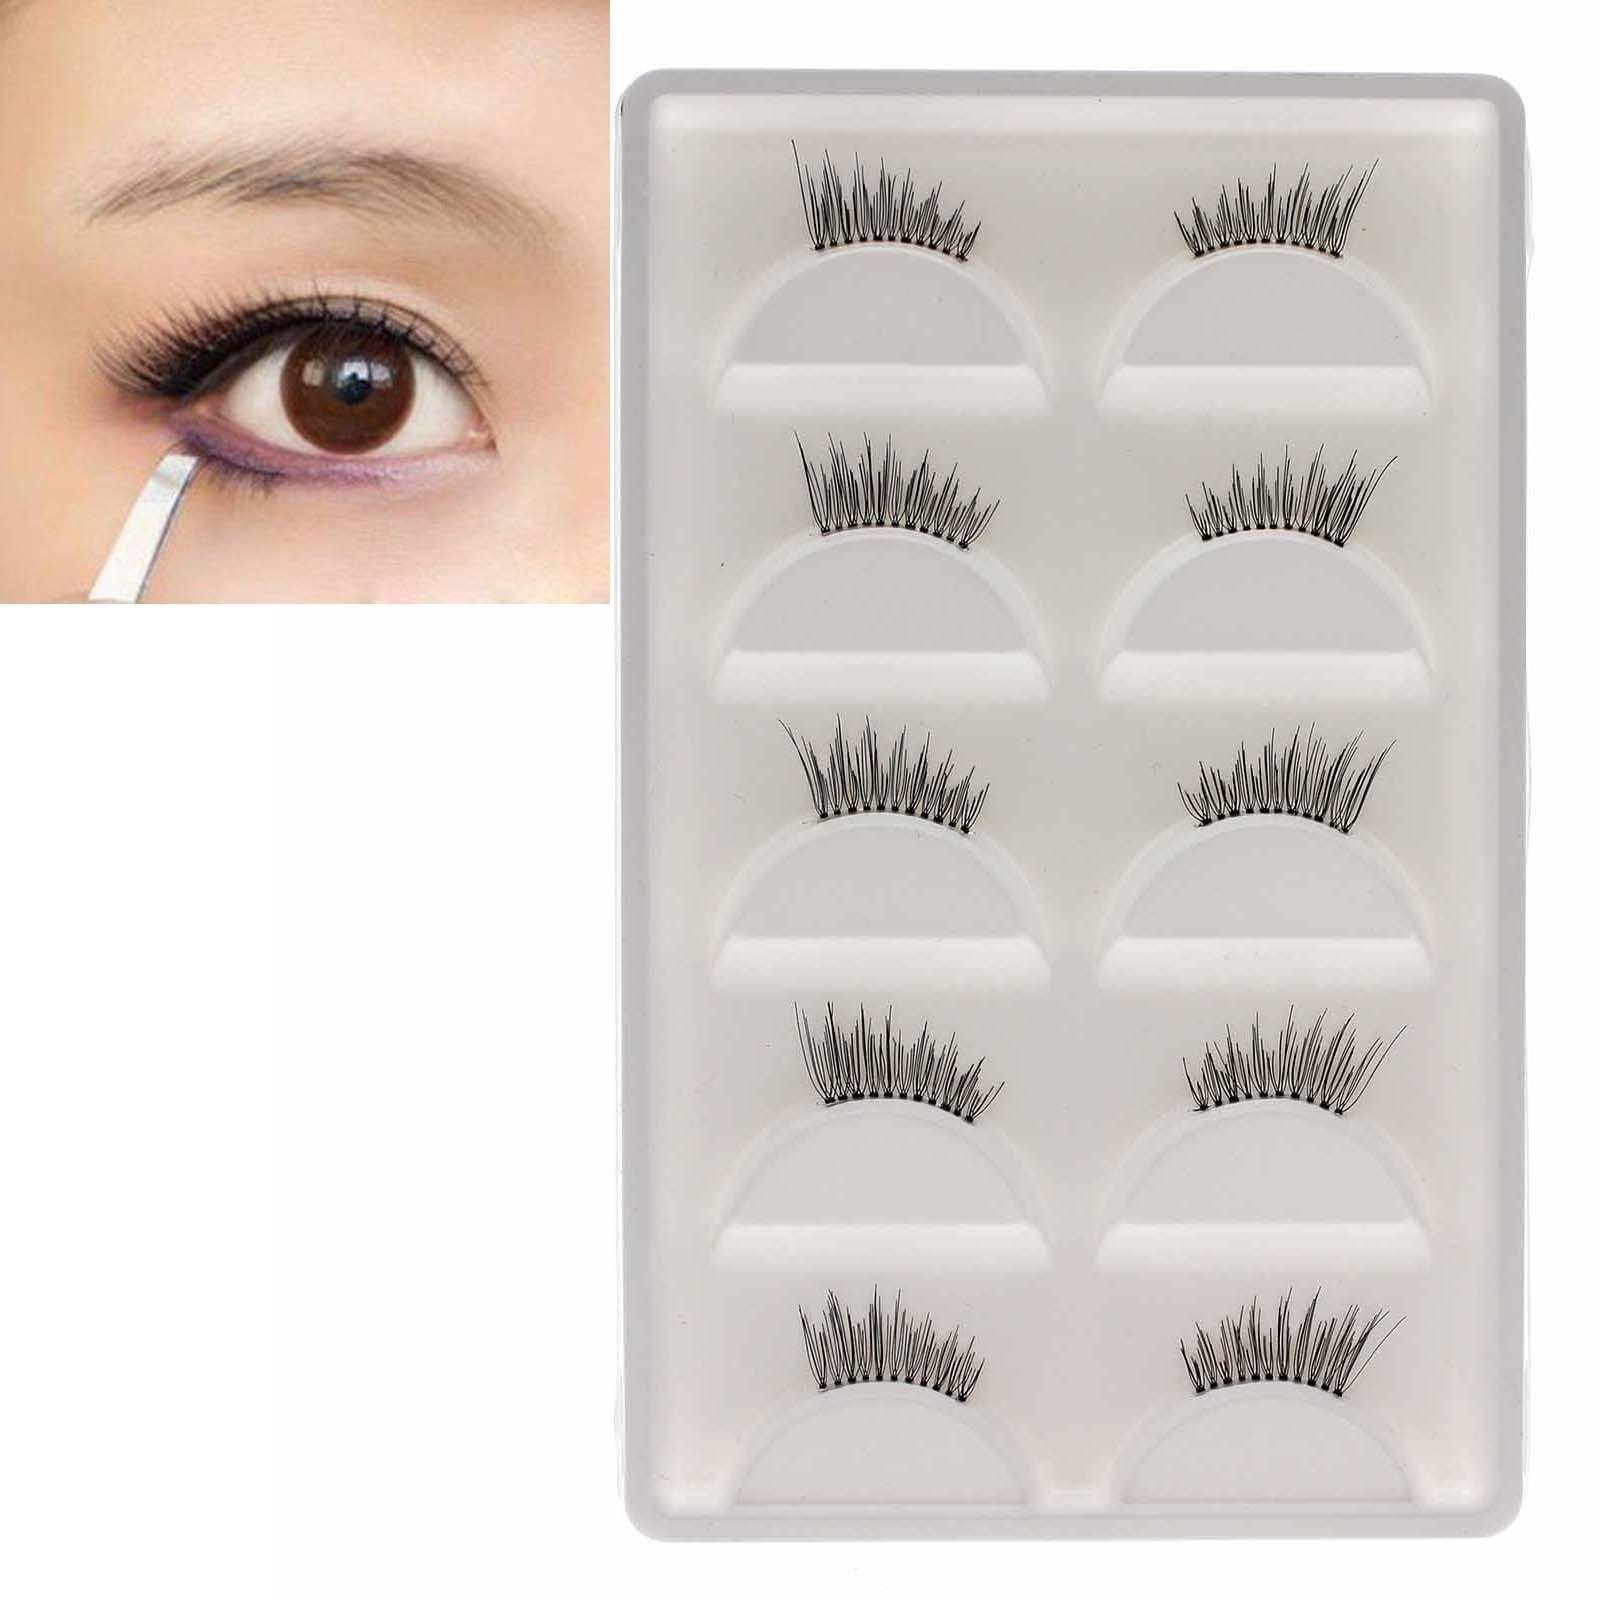 MMRM superior Falso pestañas largas pestañas belleza herramienta de maquillaje cosmético product image